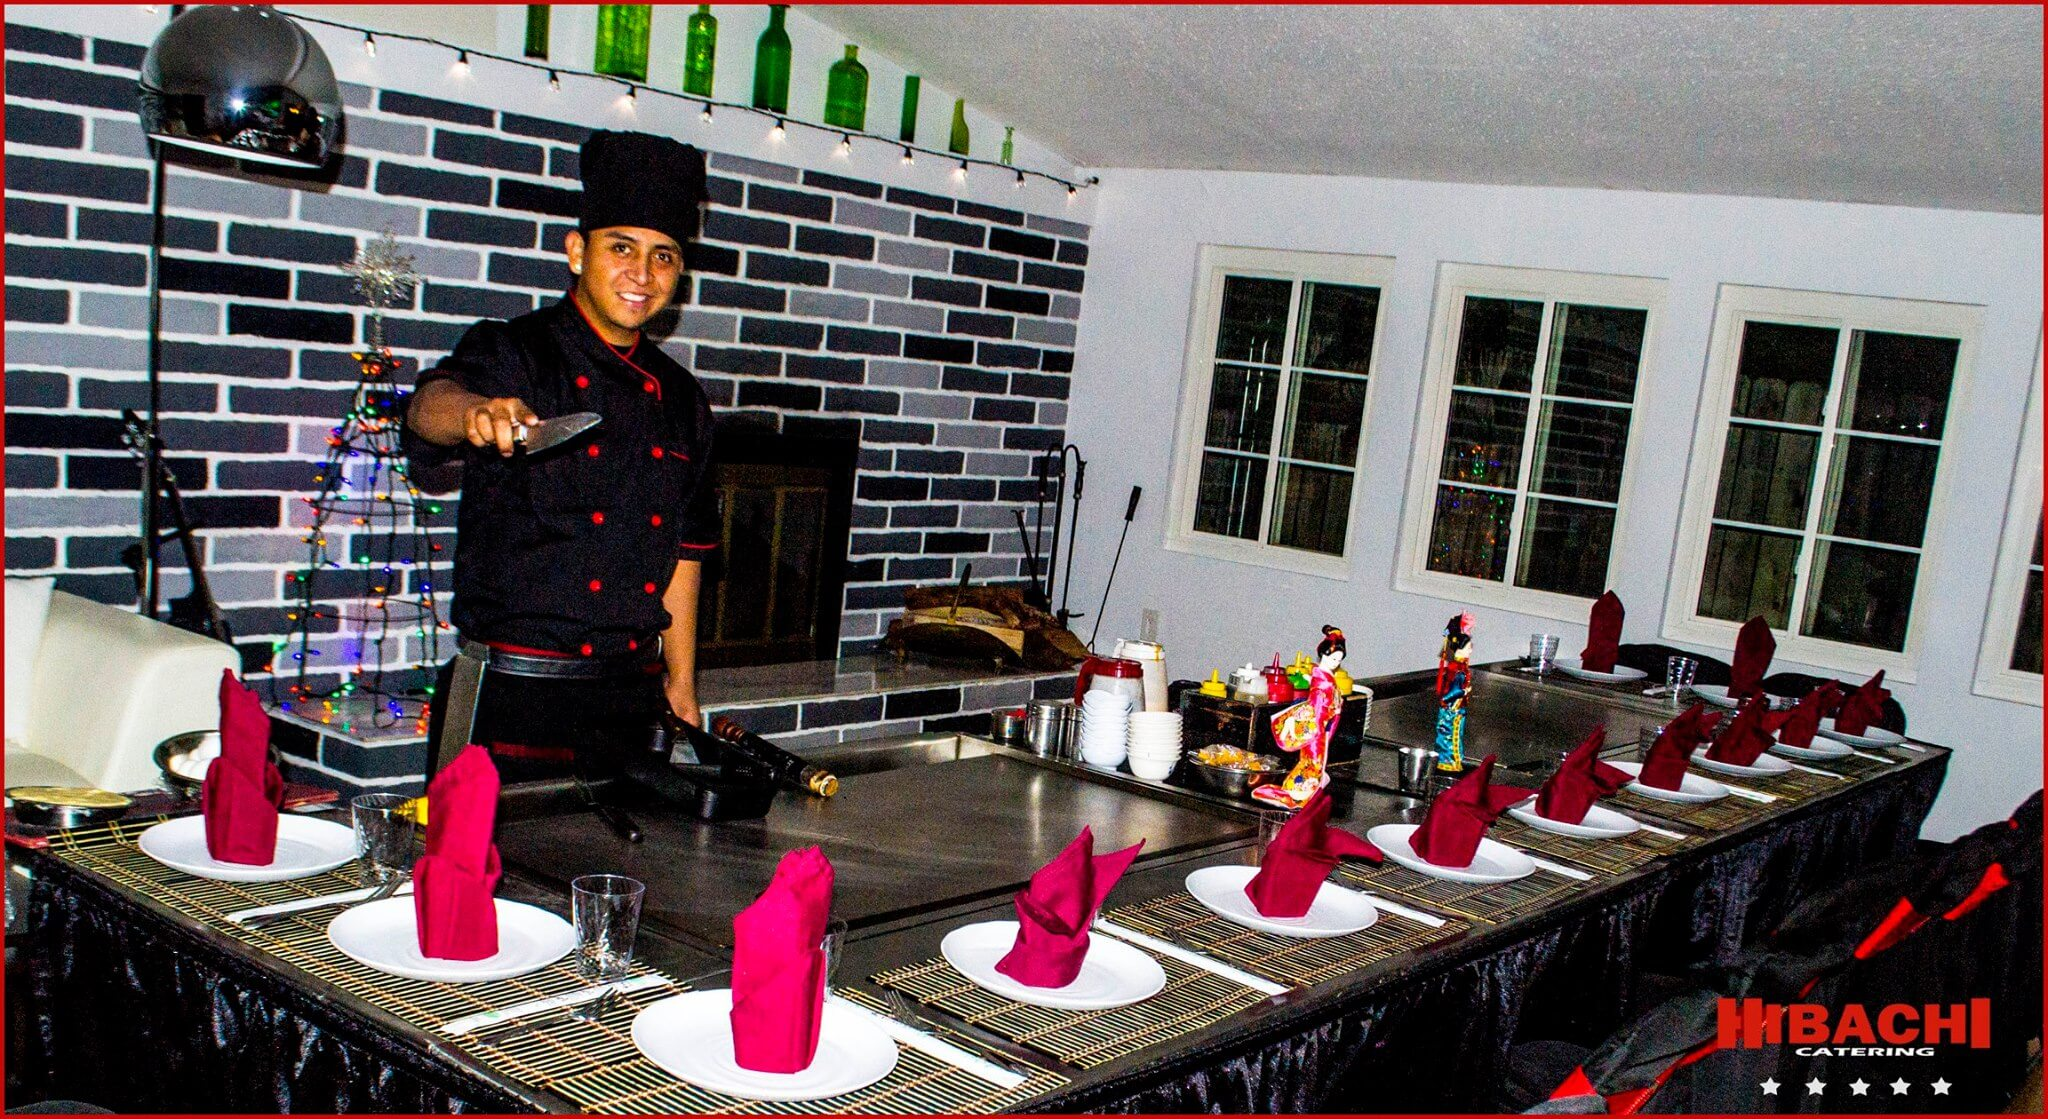 hibachi catering